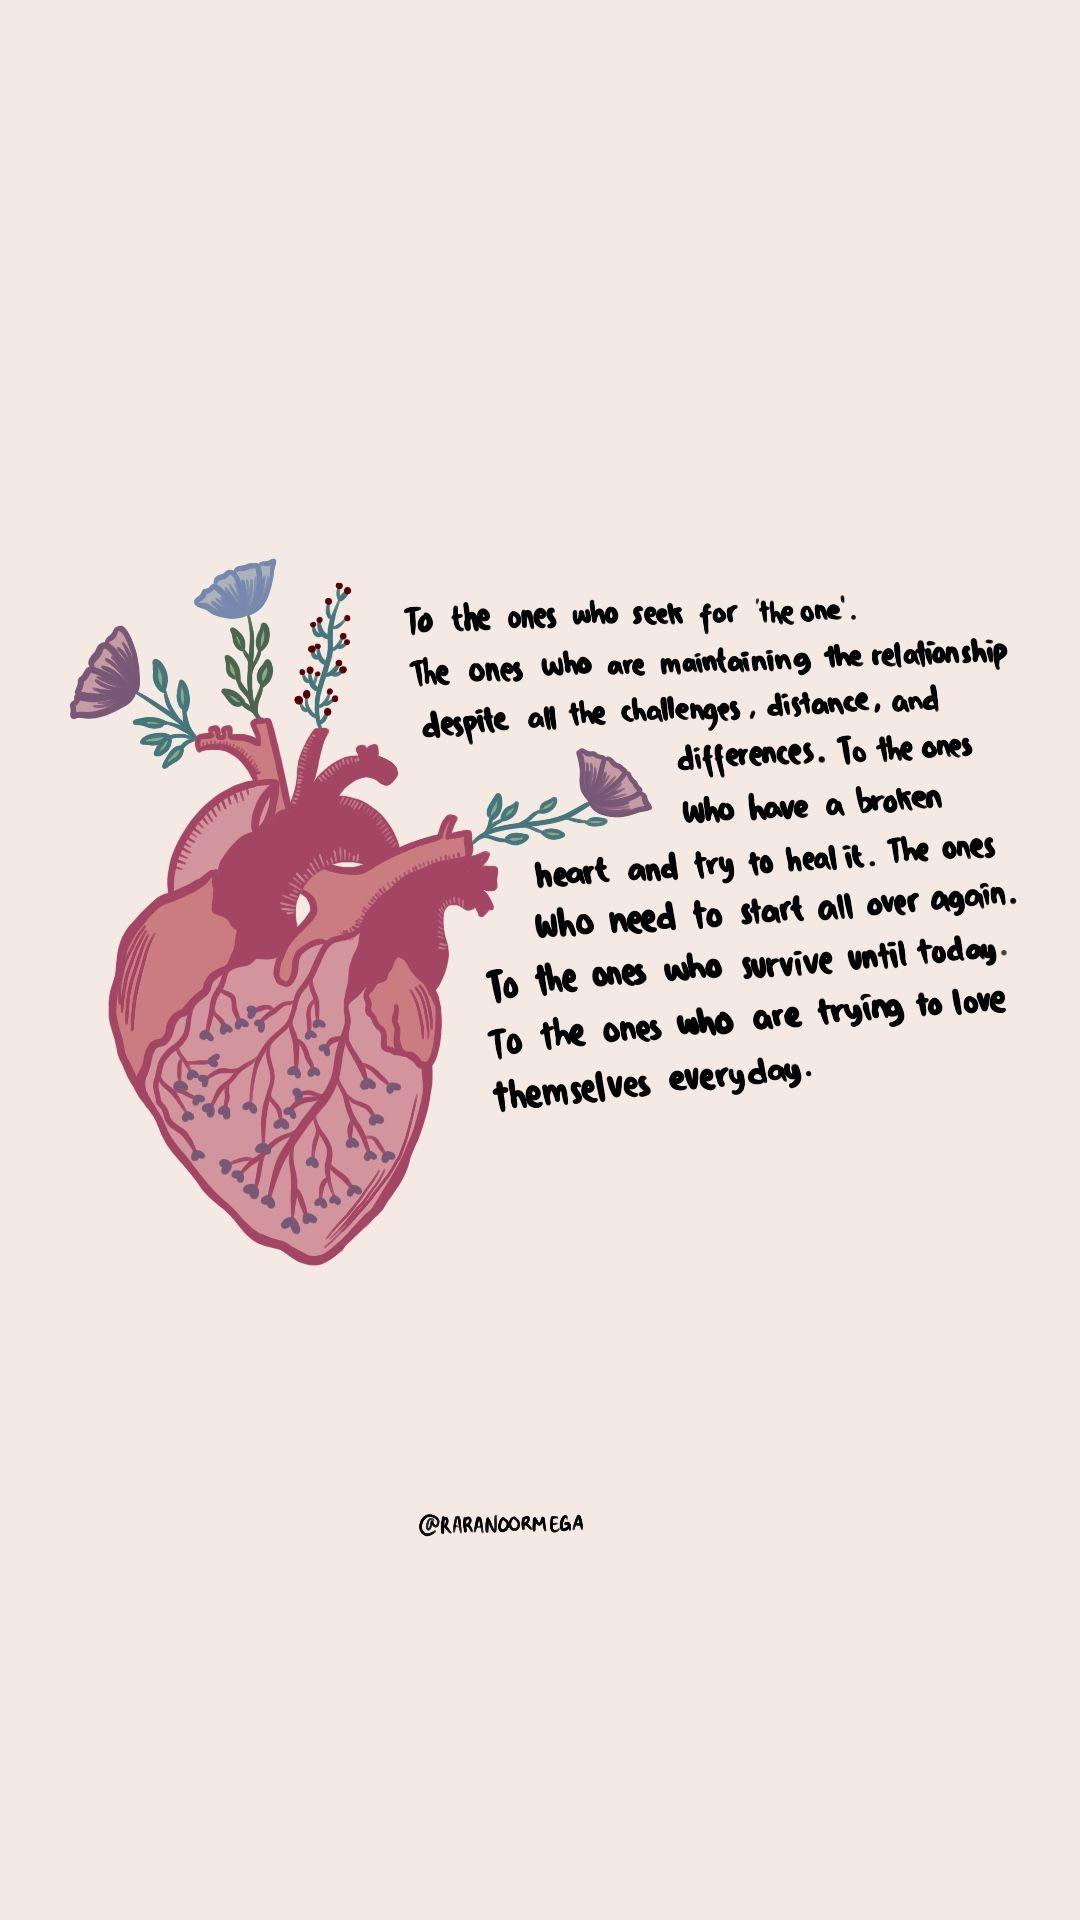 Projectinnervoice Appreciation Quotes Motivational Art Quotes Empowerment Quotes